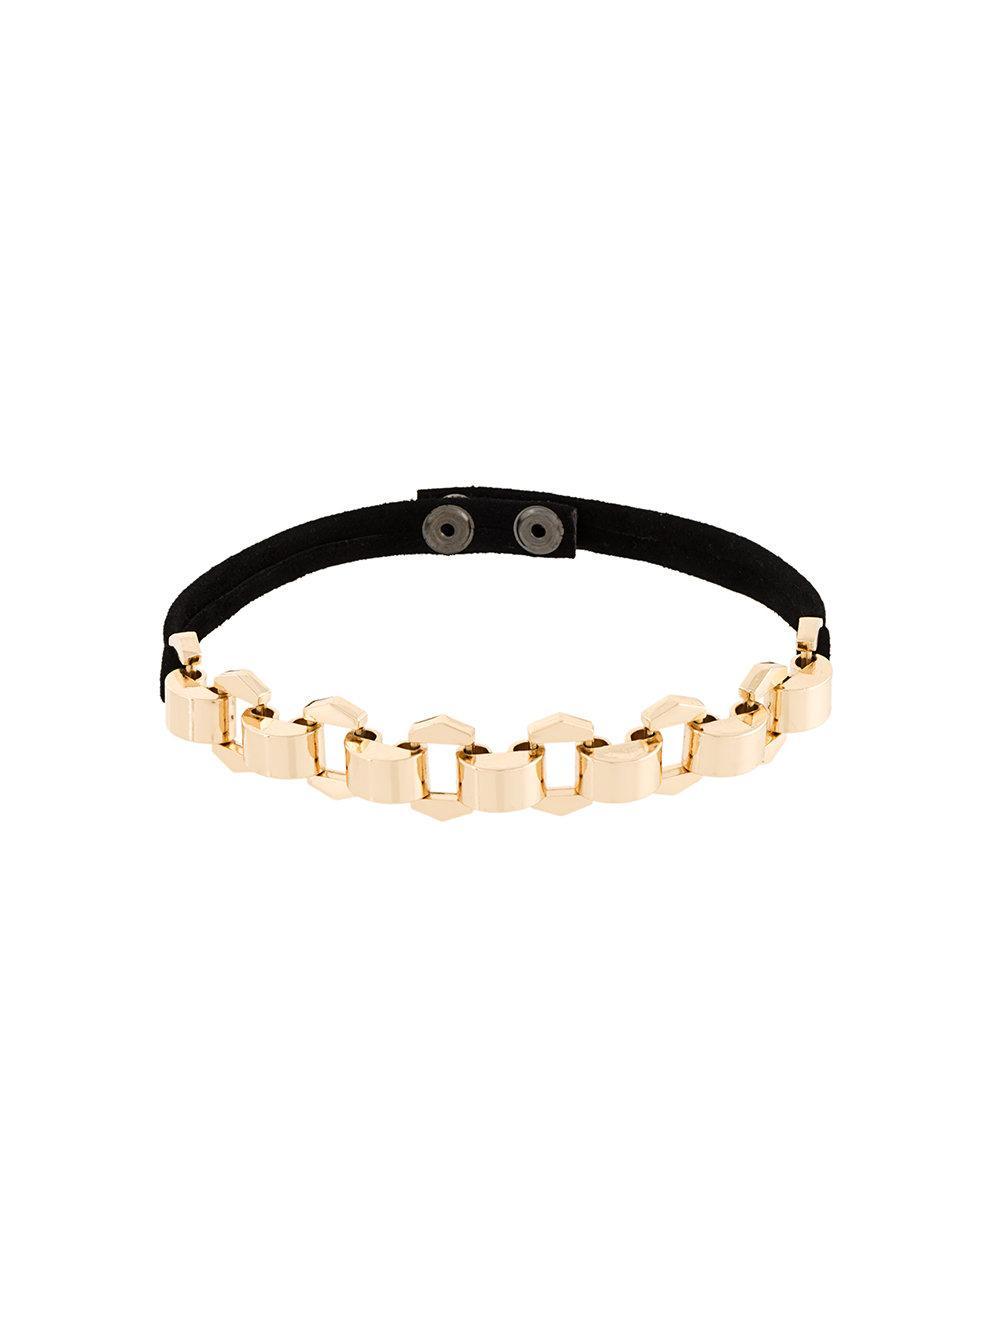 Manokhi Chained Collar - Black